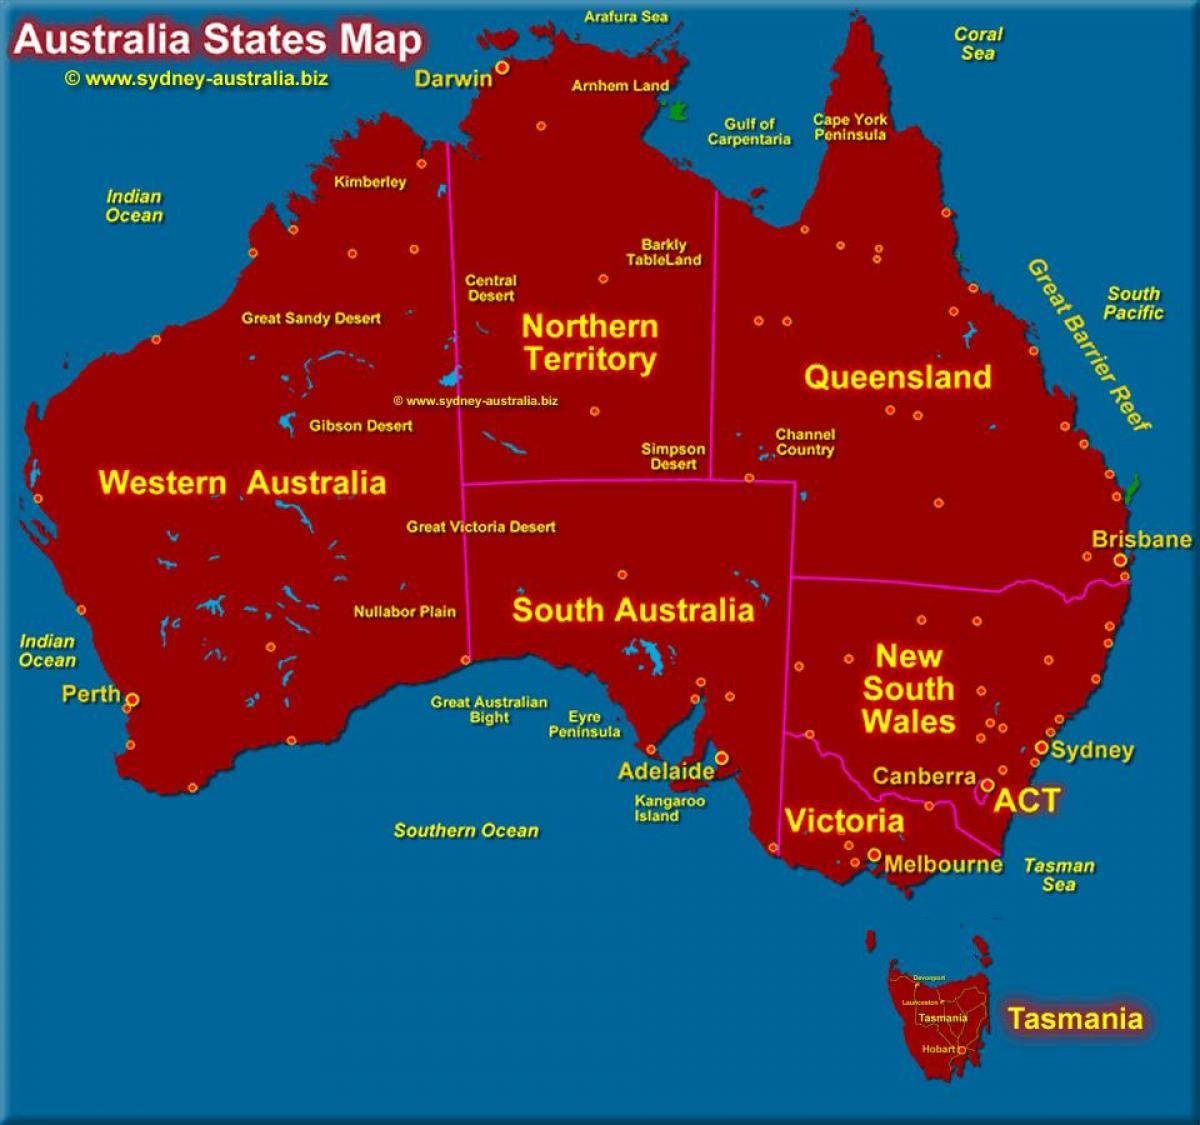 Australien Karta Lander.Australien Karta Med Stater Karta Over Australien Visar Staterna